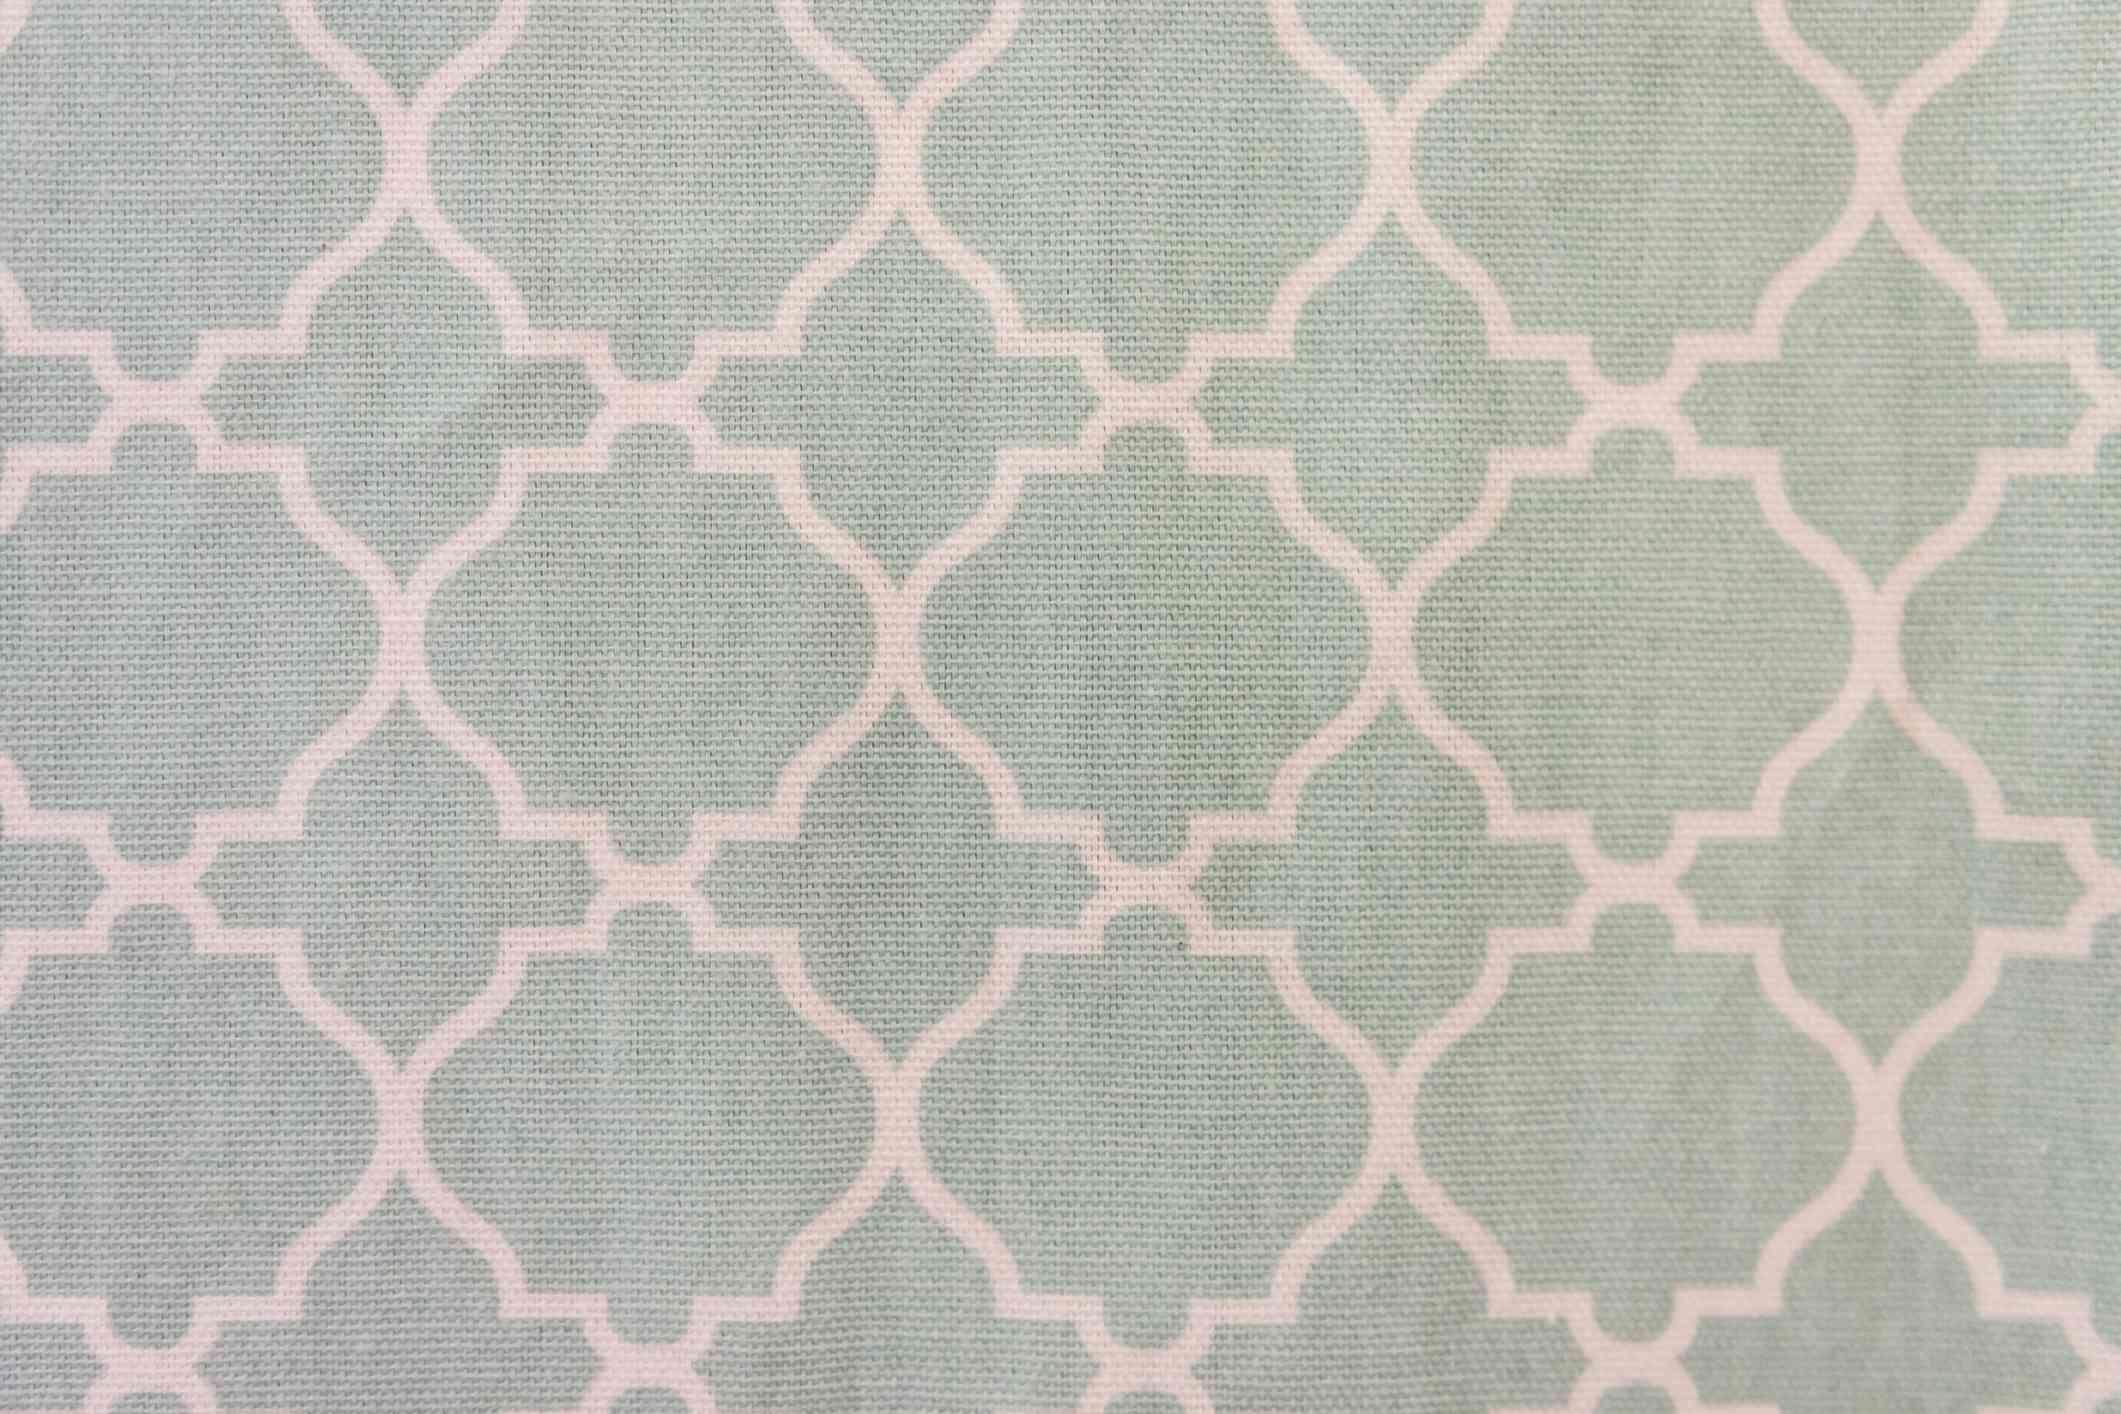 Trellis patterned fabric